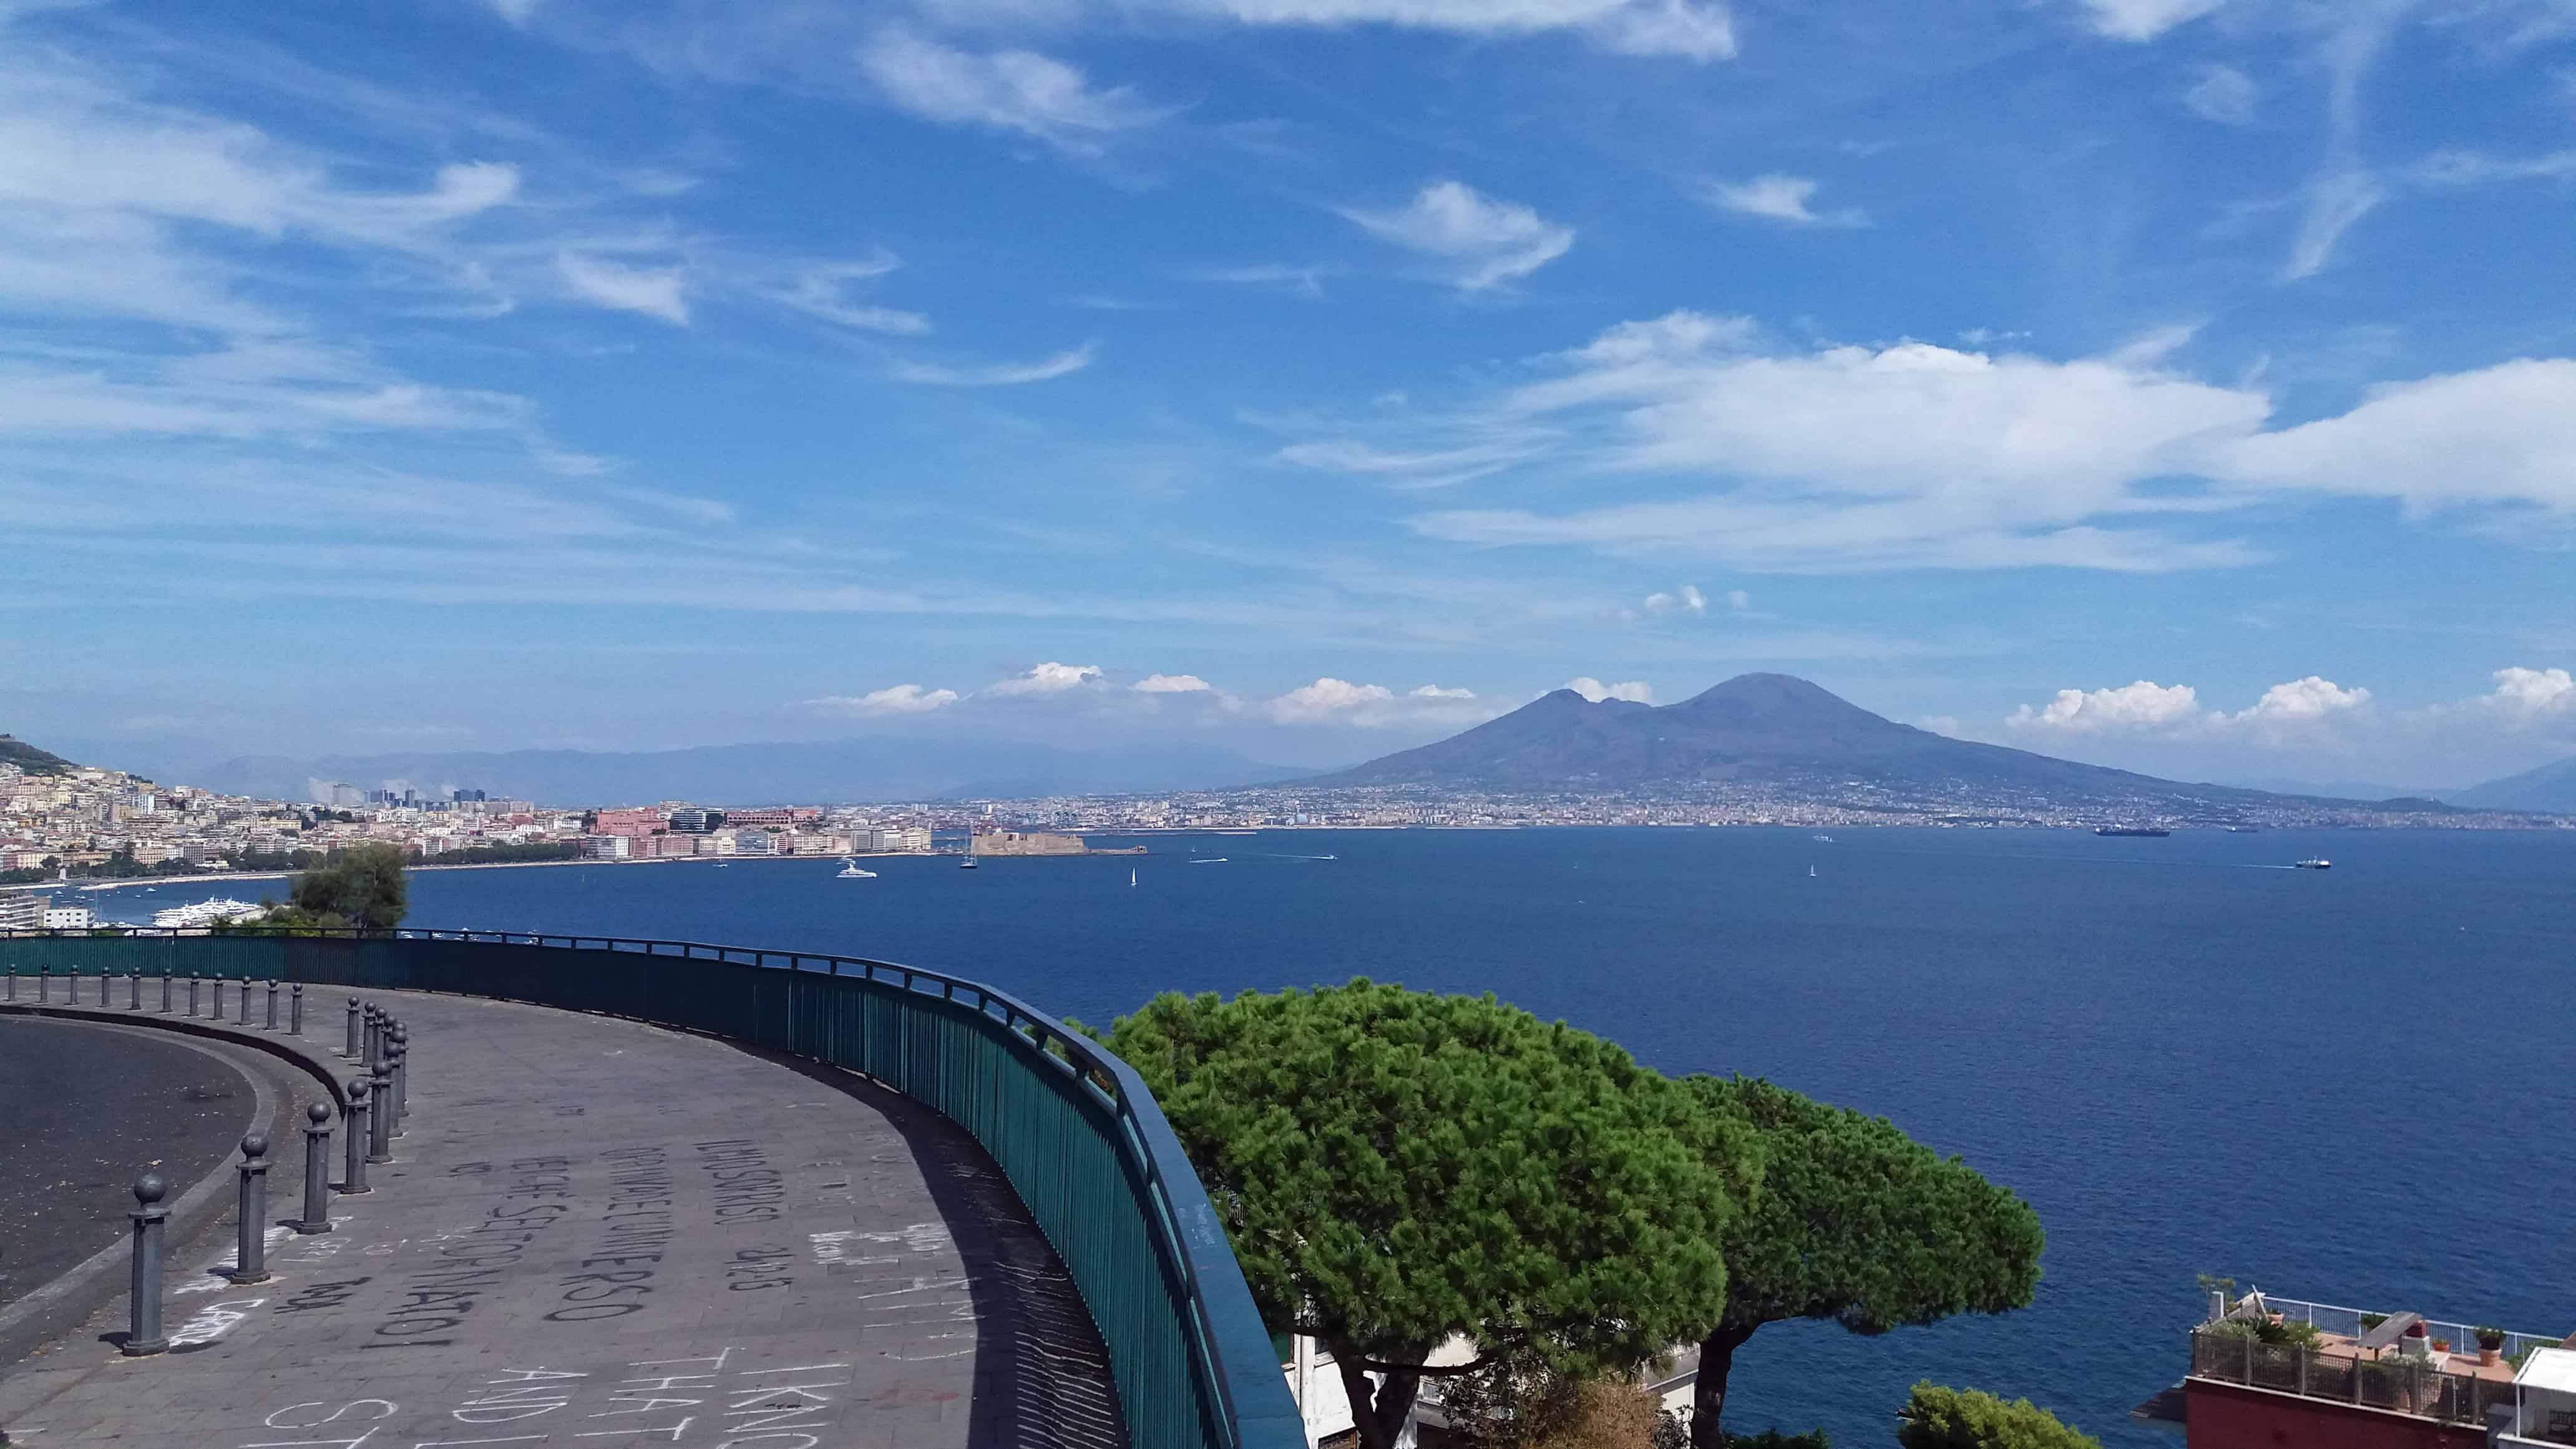 Vesuvius & Bay of Naples